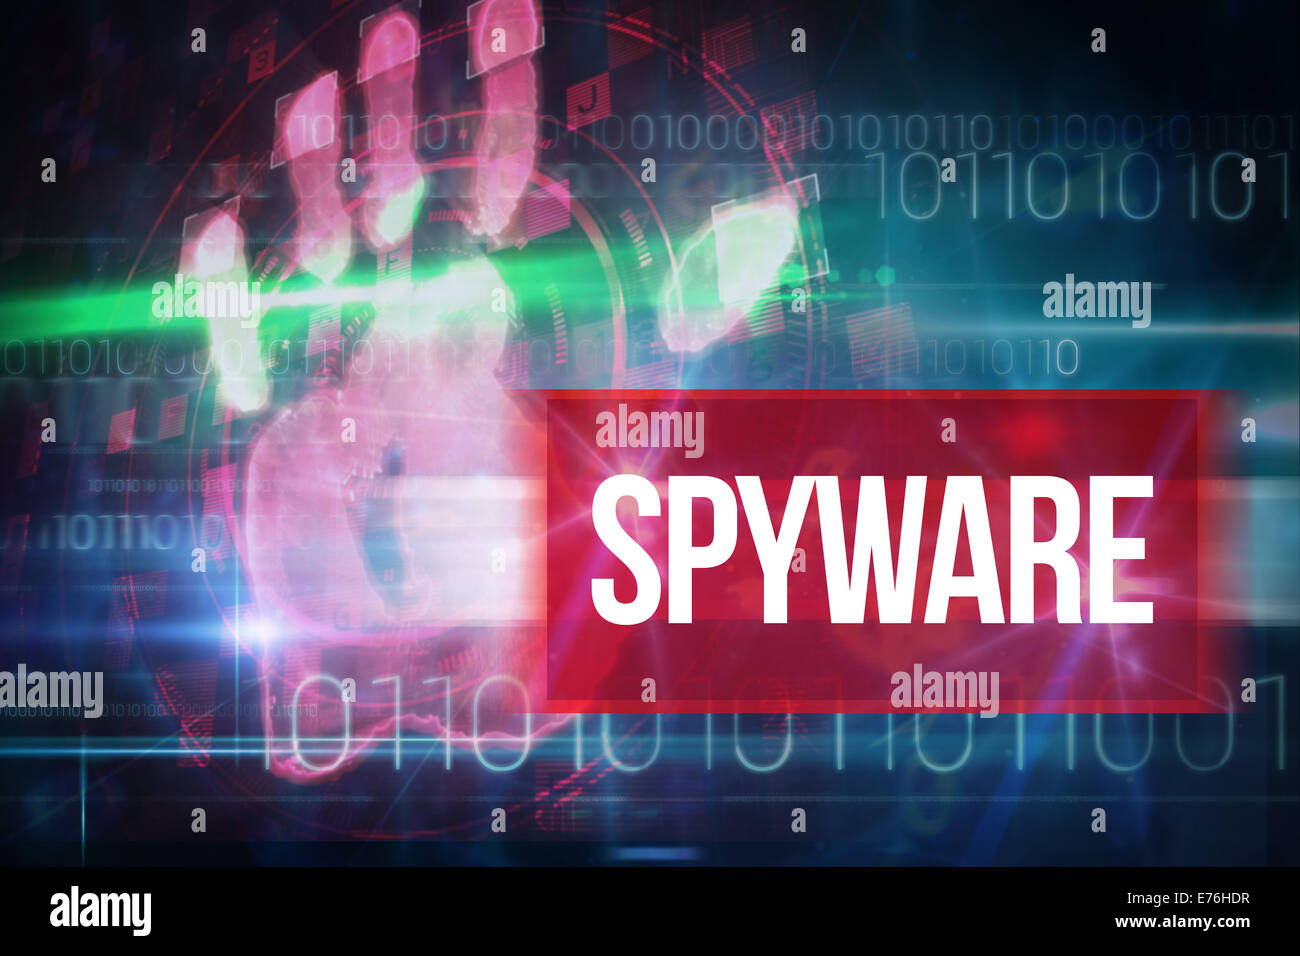 Spyware contra azul con diseño de tecnología de código binario Imagen De Stock